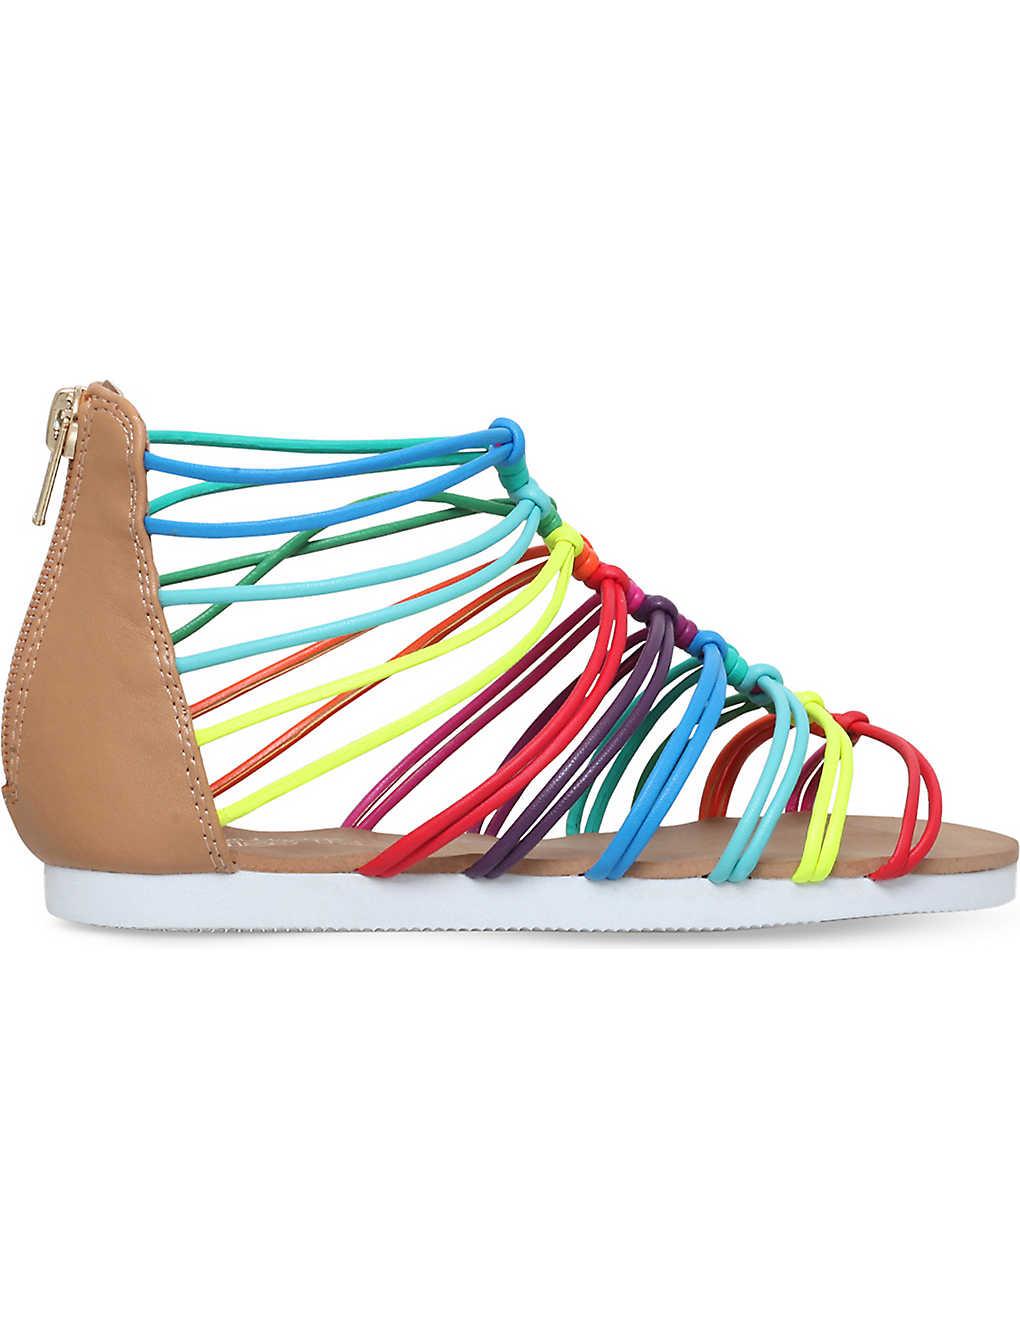 411d33d26880 MINI MISS KG - Rainbow multi-coloured sandals 7 - 10 years ...